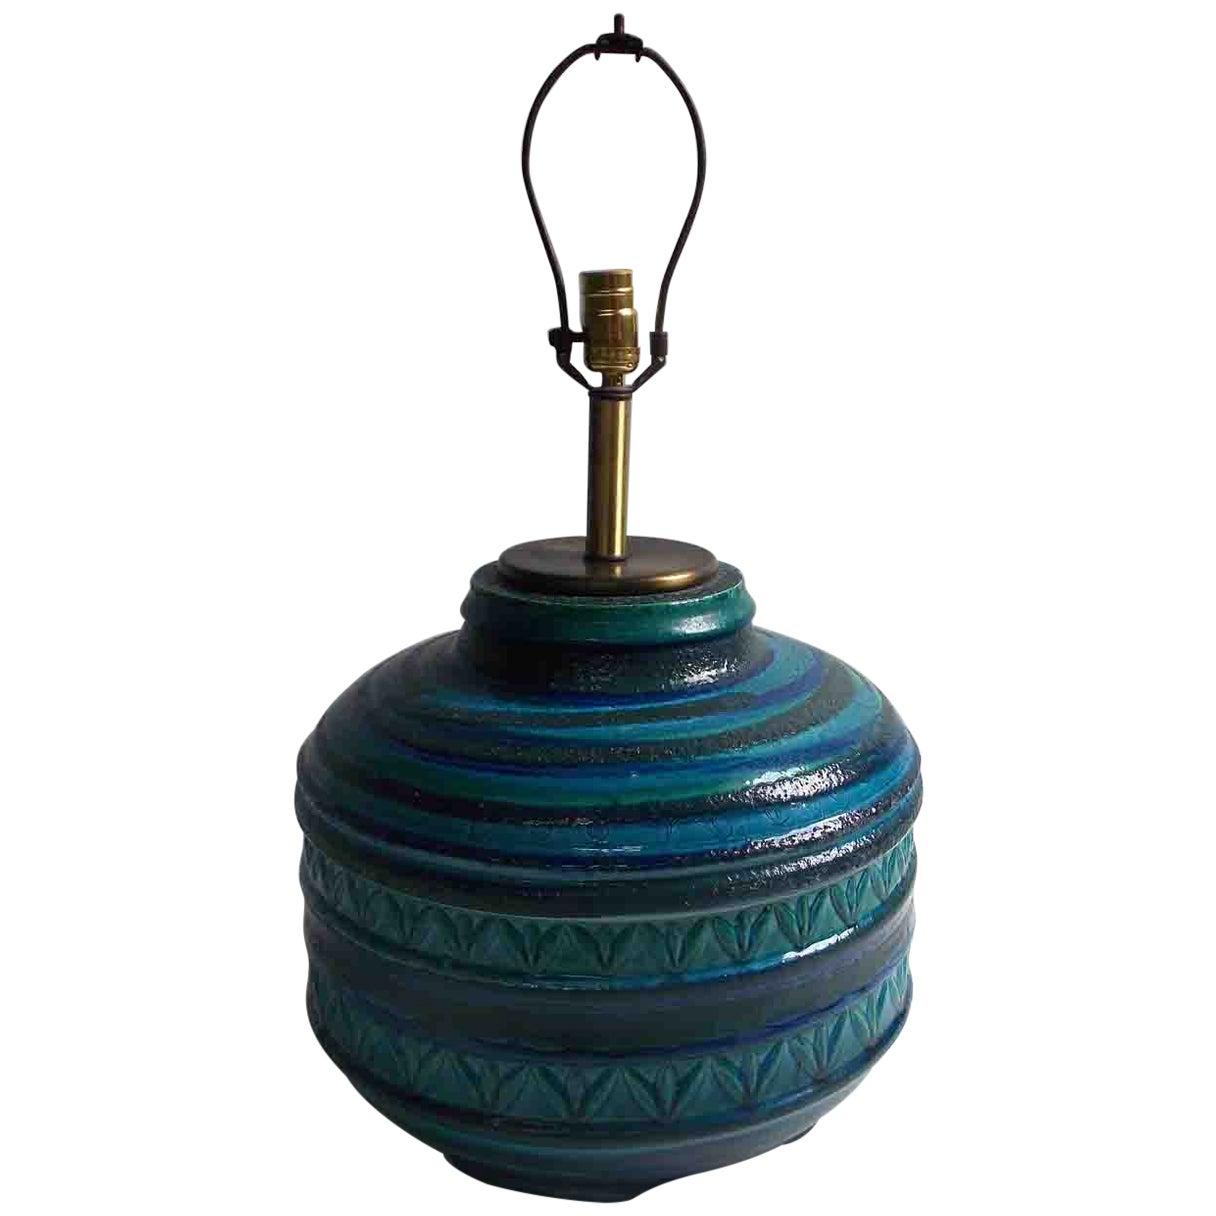 Aldo Londi for Bitossi Rimini Blue Lamp